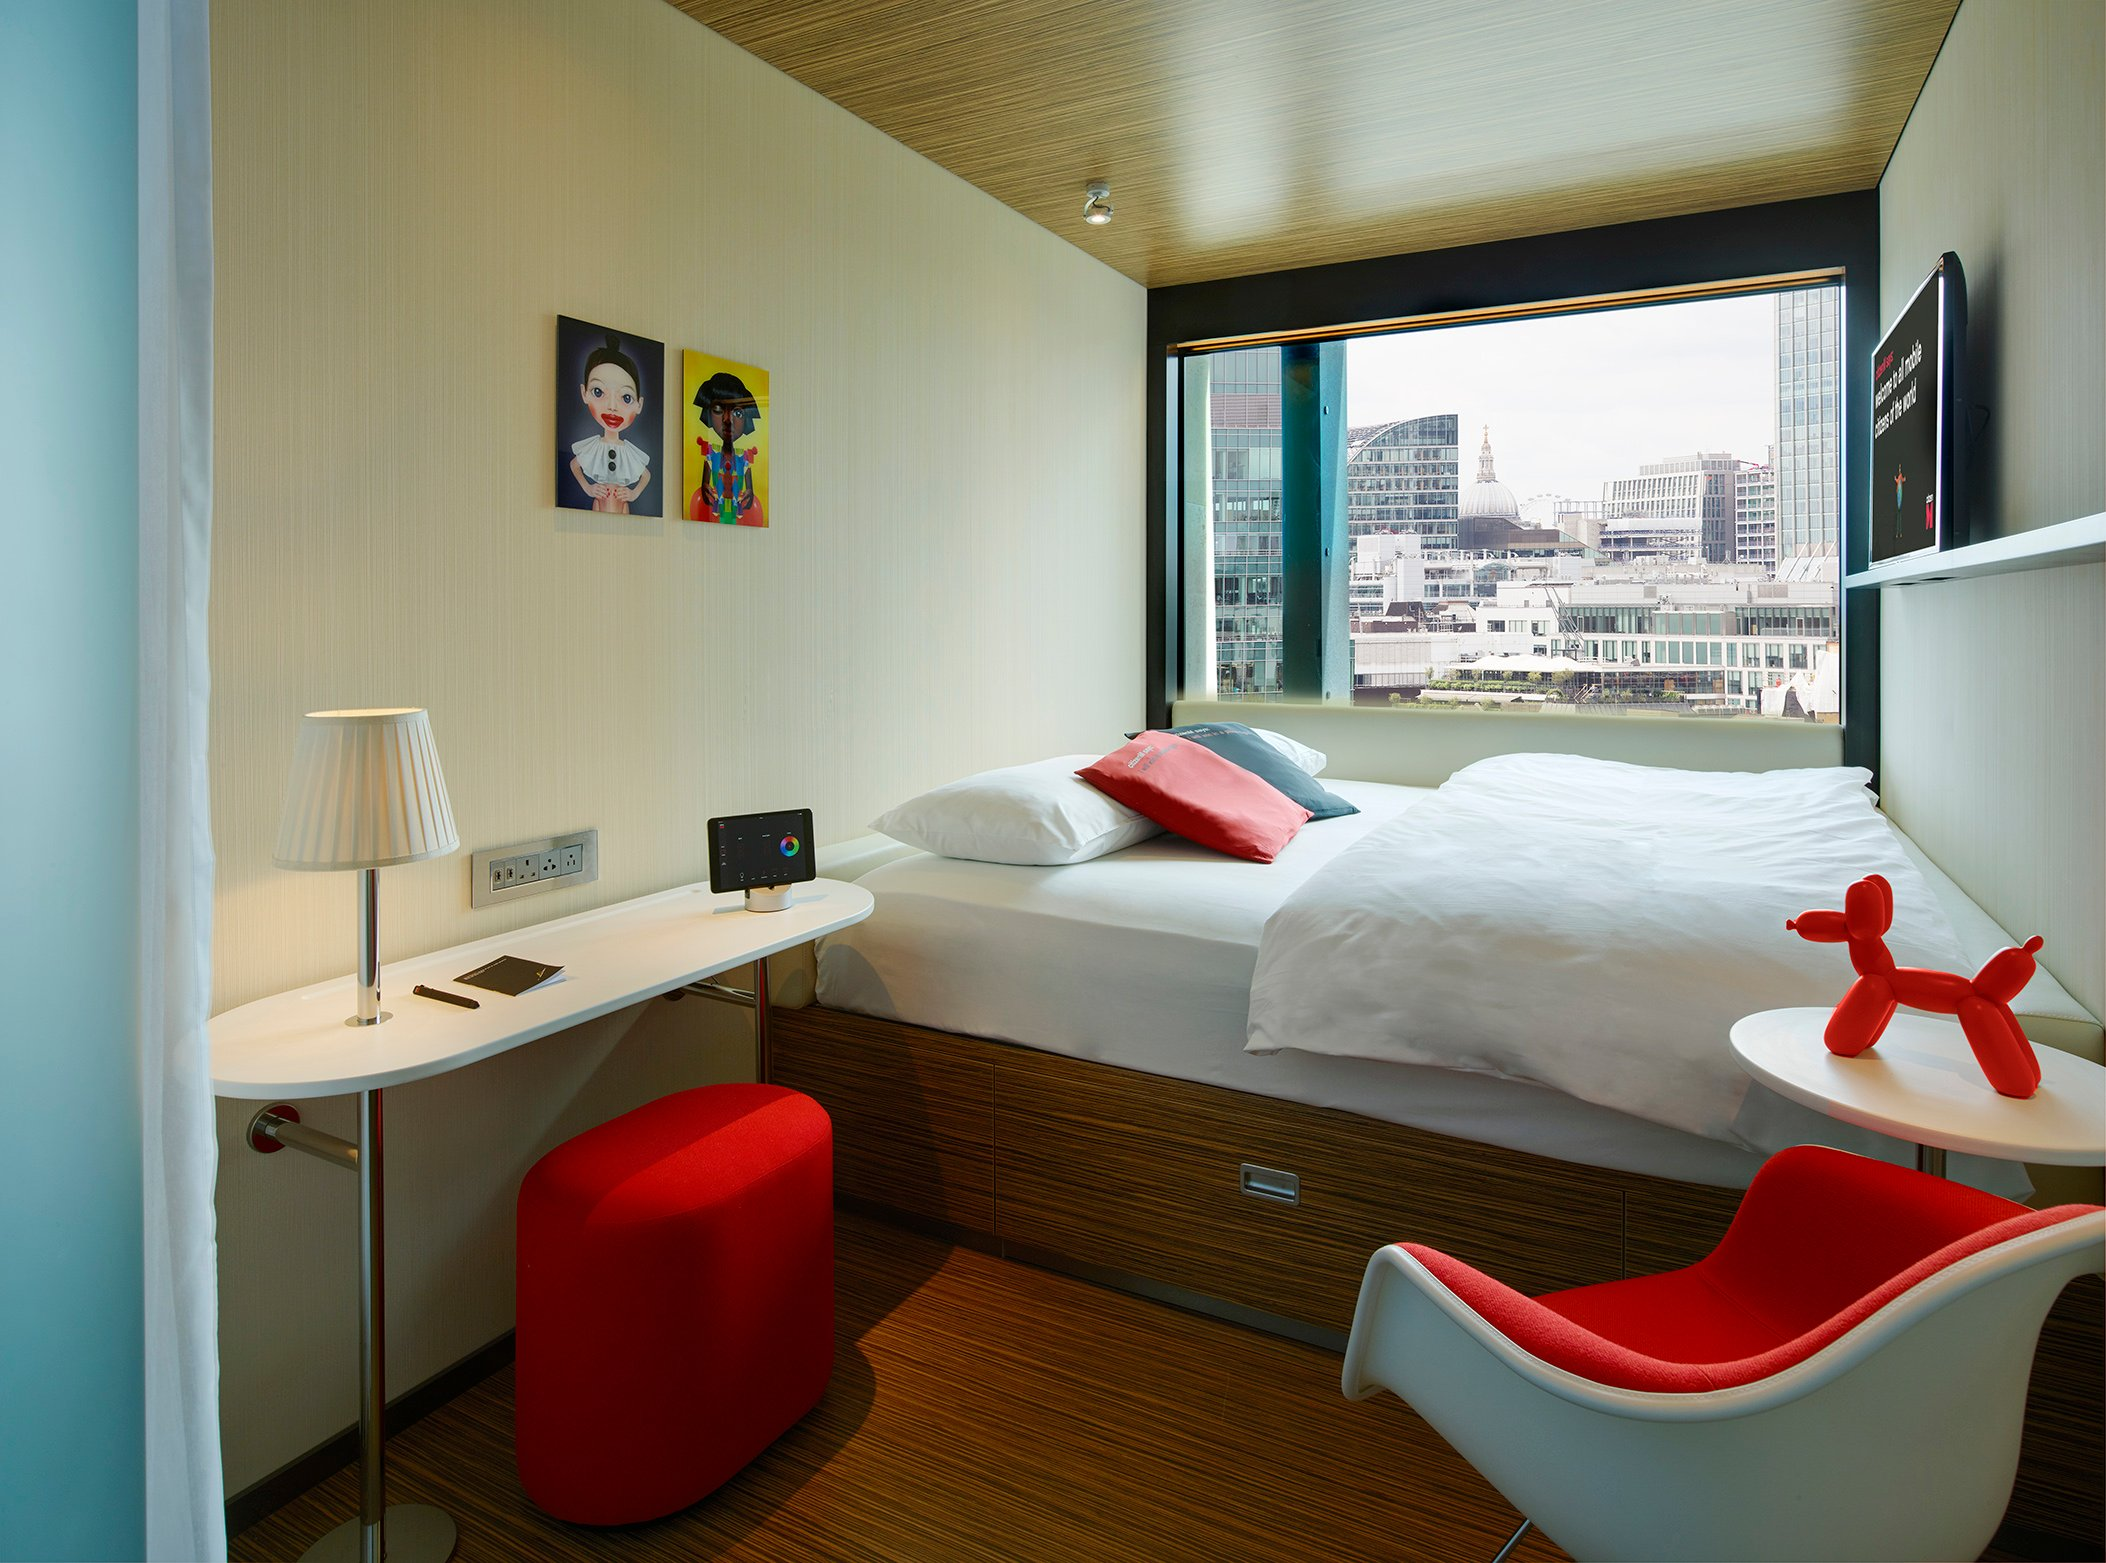 Citizenm london shoreditch updated 2017 hotel reviews price comparison england tripadvisor - Design hotel citizenm london ...